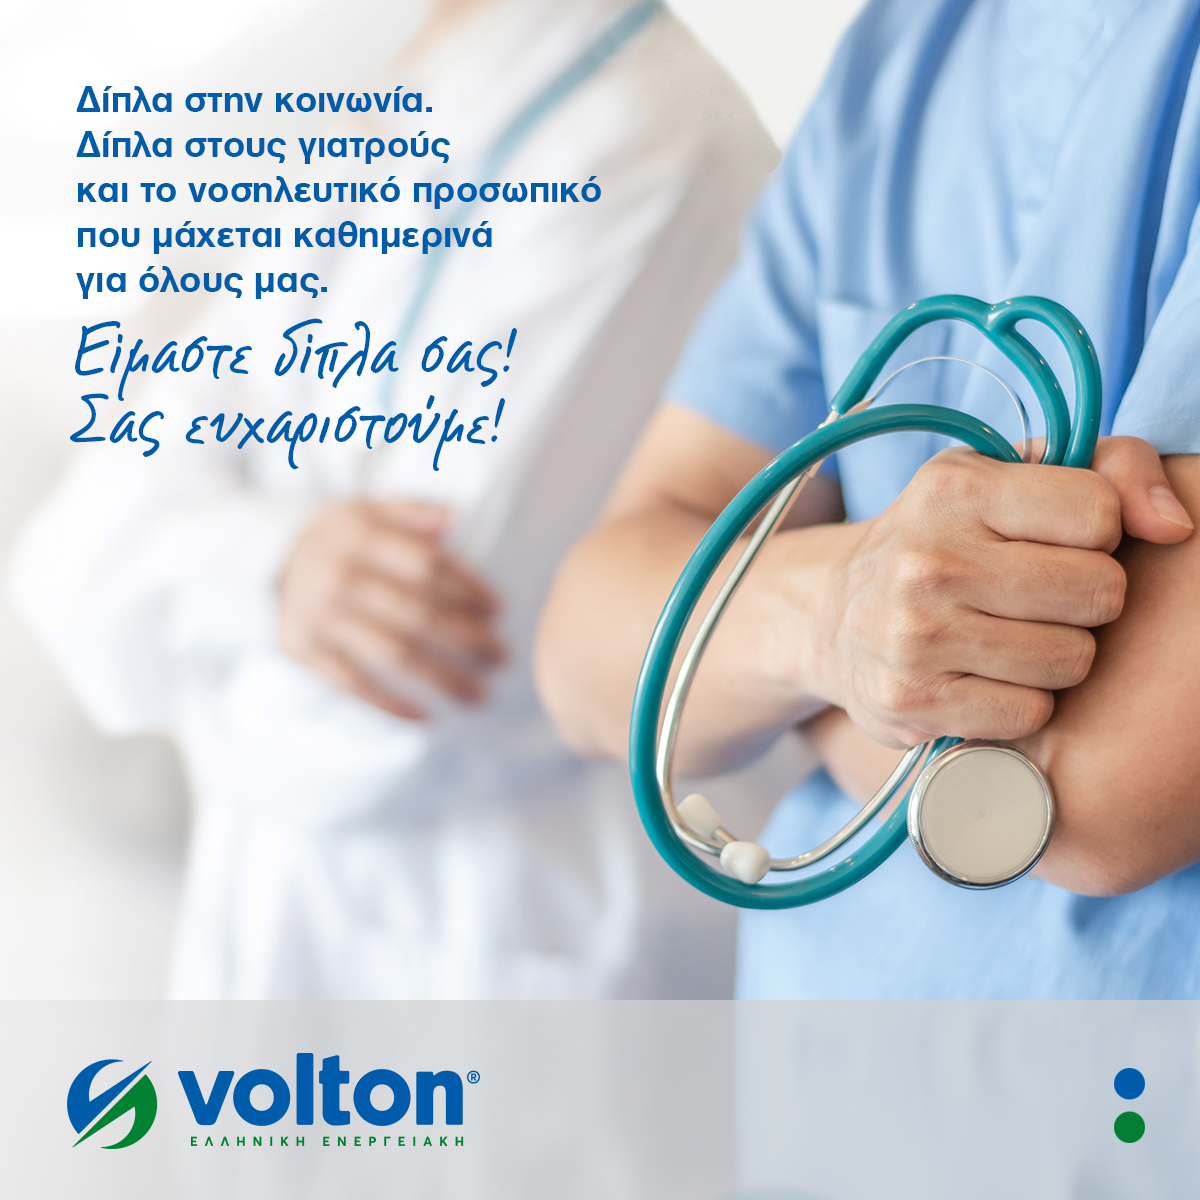 Volton Δωρεά 10 υπερσύγχρονων κλινών ΜΕΘ στο Εθνικό Σύστημα Υγείας